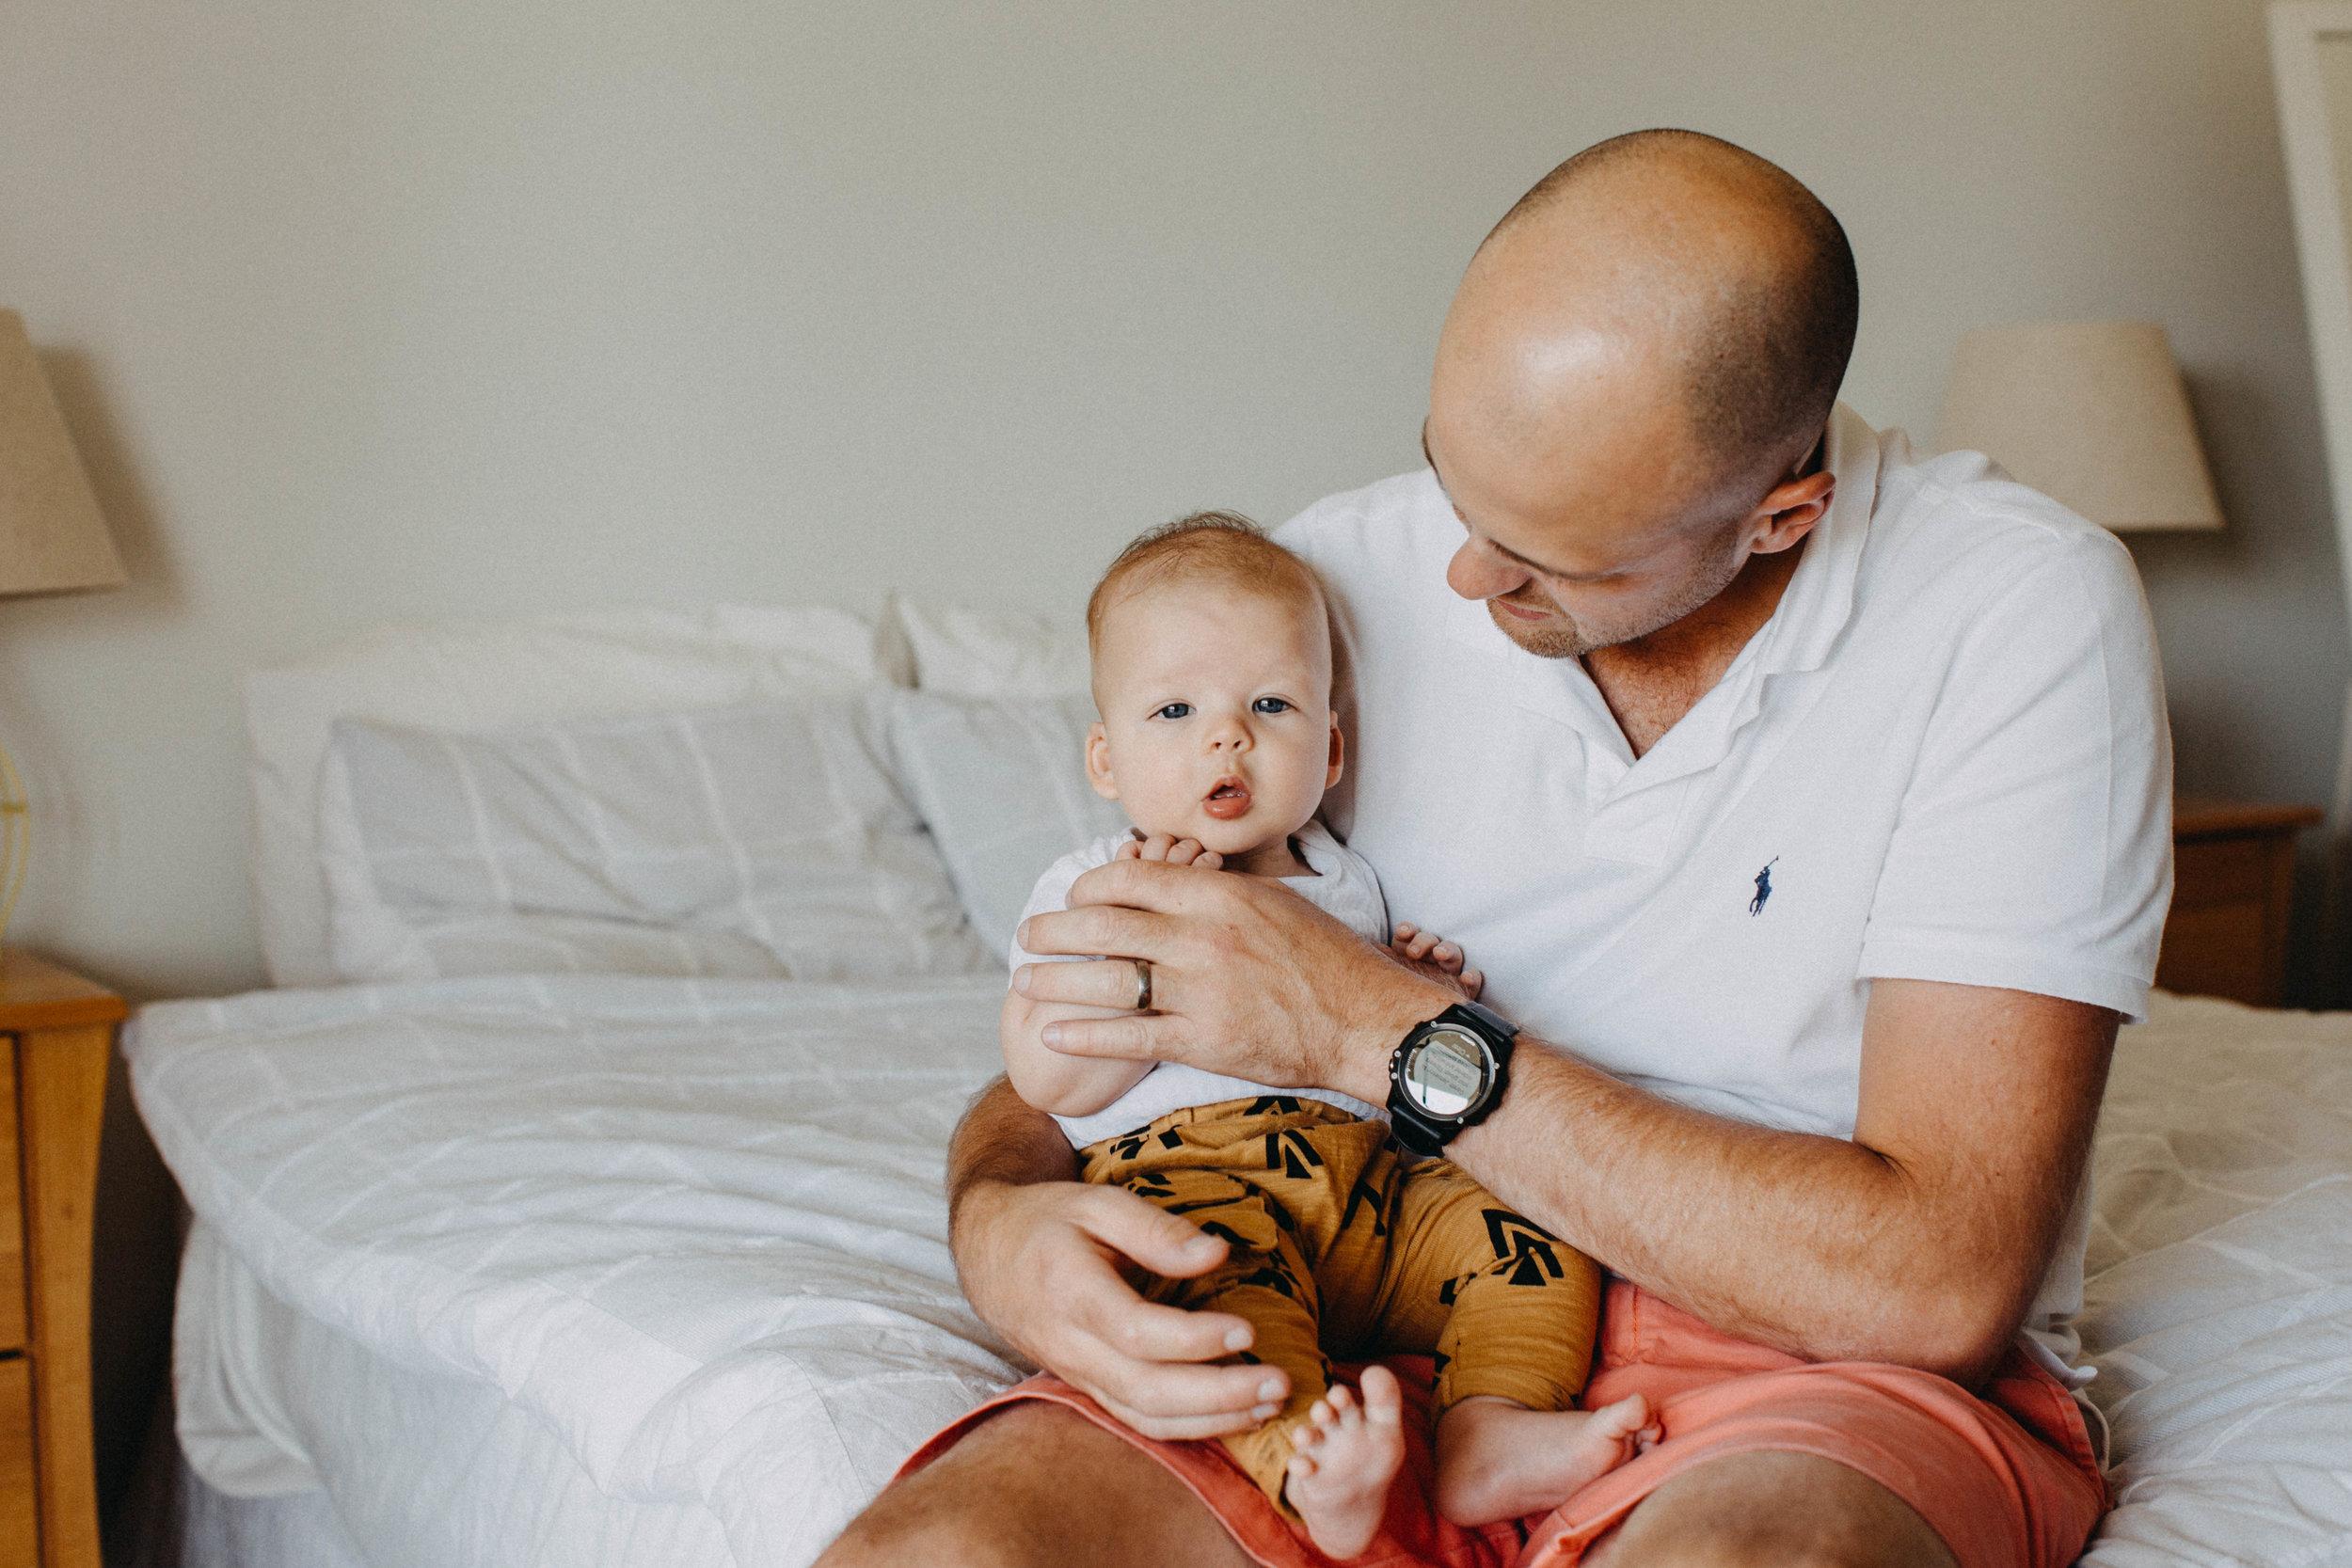 family-photography-picton-lifestyle-www.emilyobrienphotography.net-35.jpg